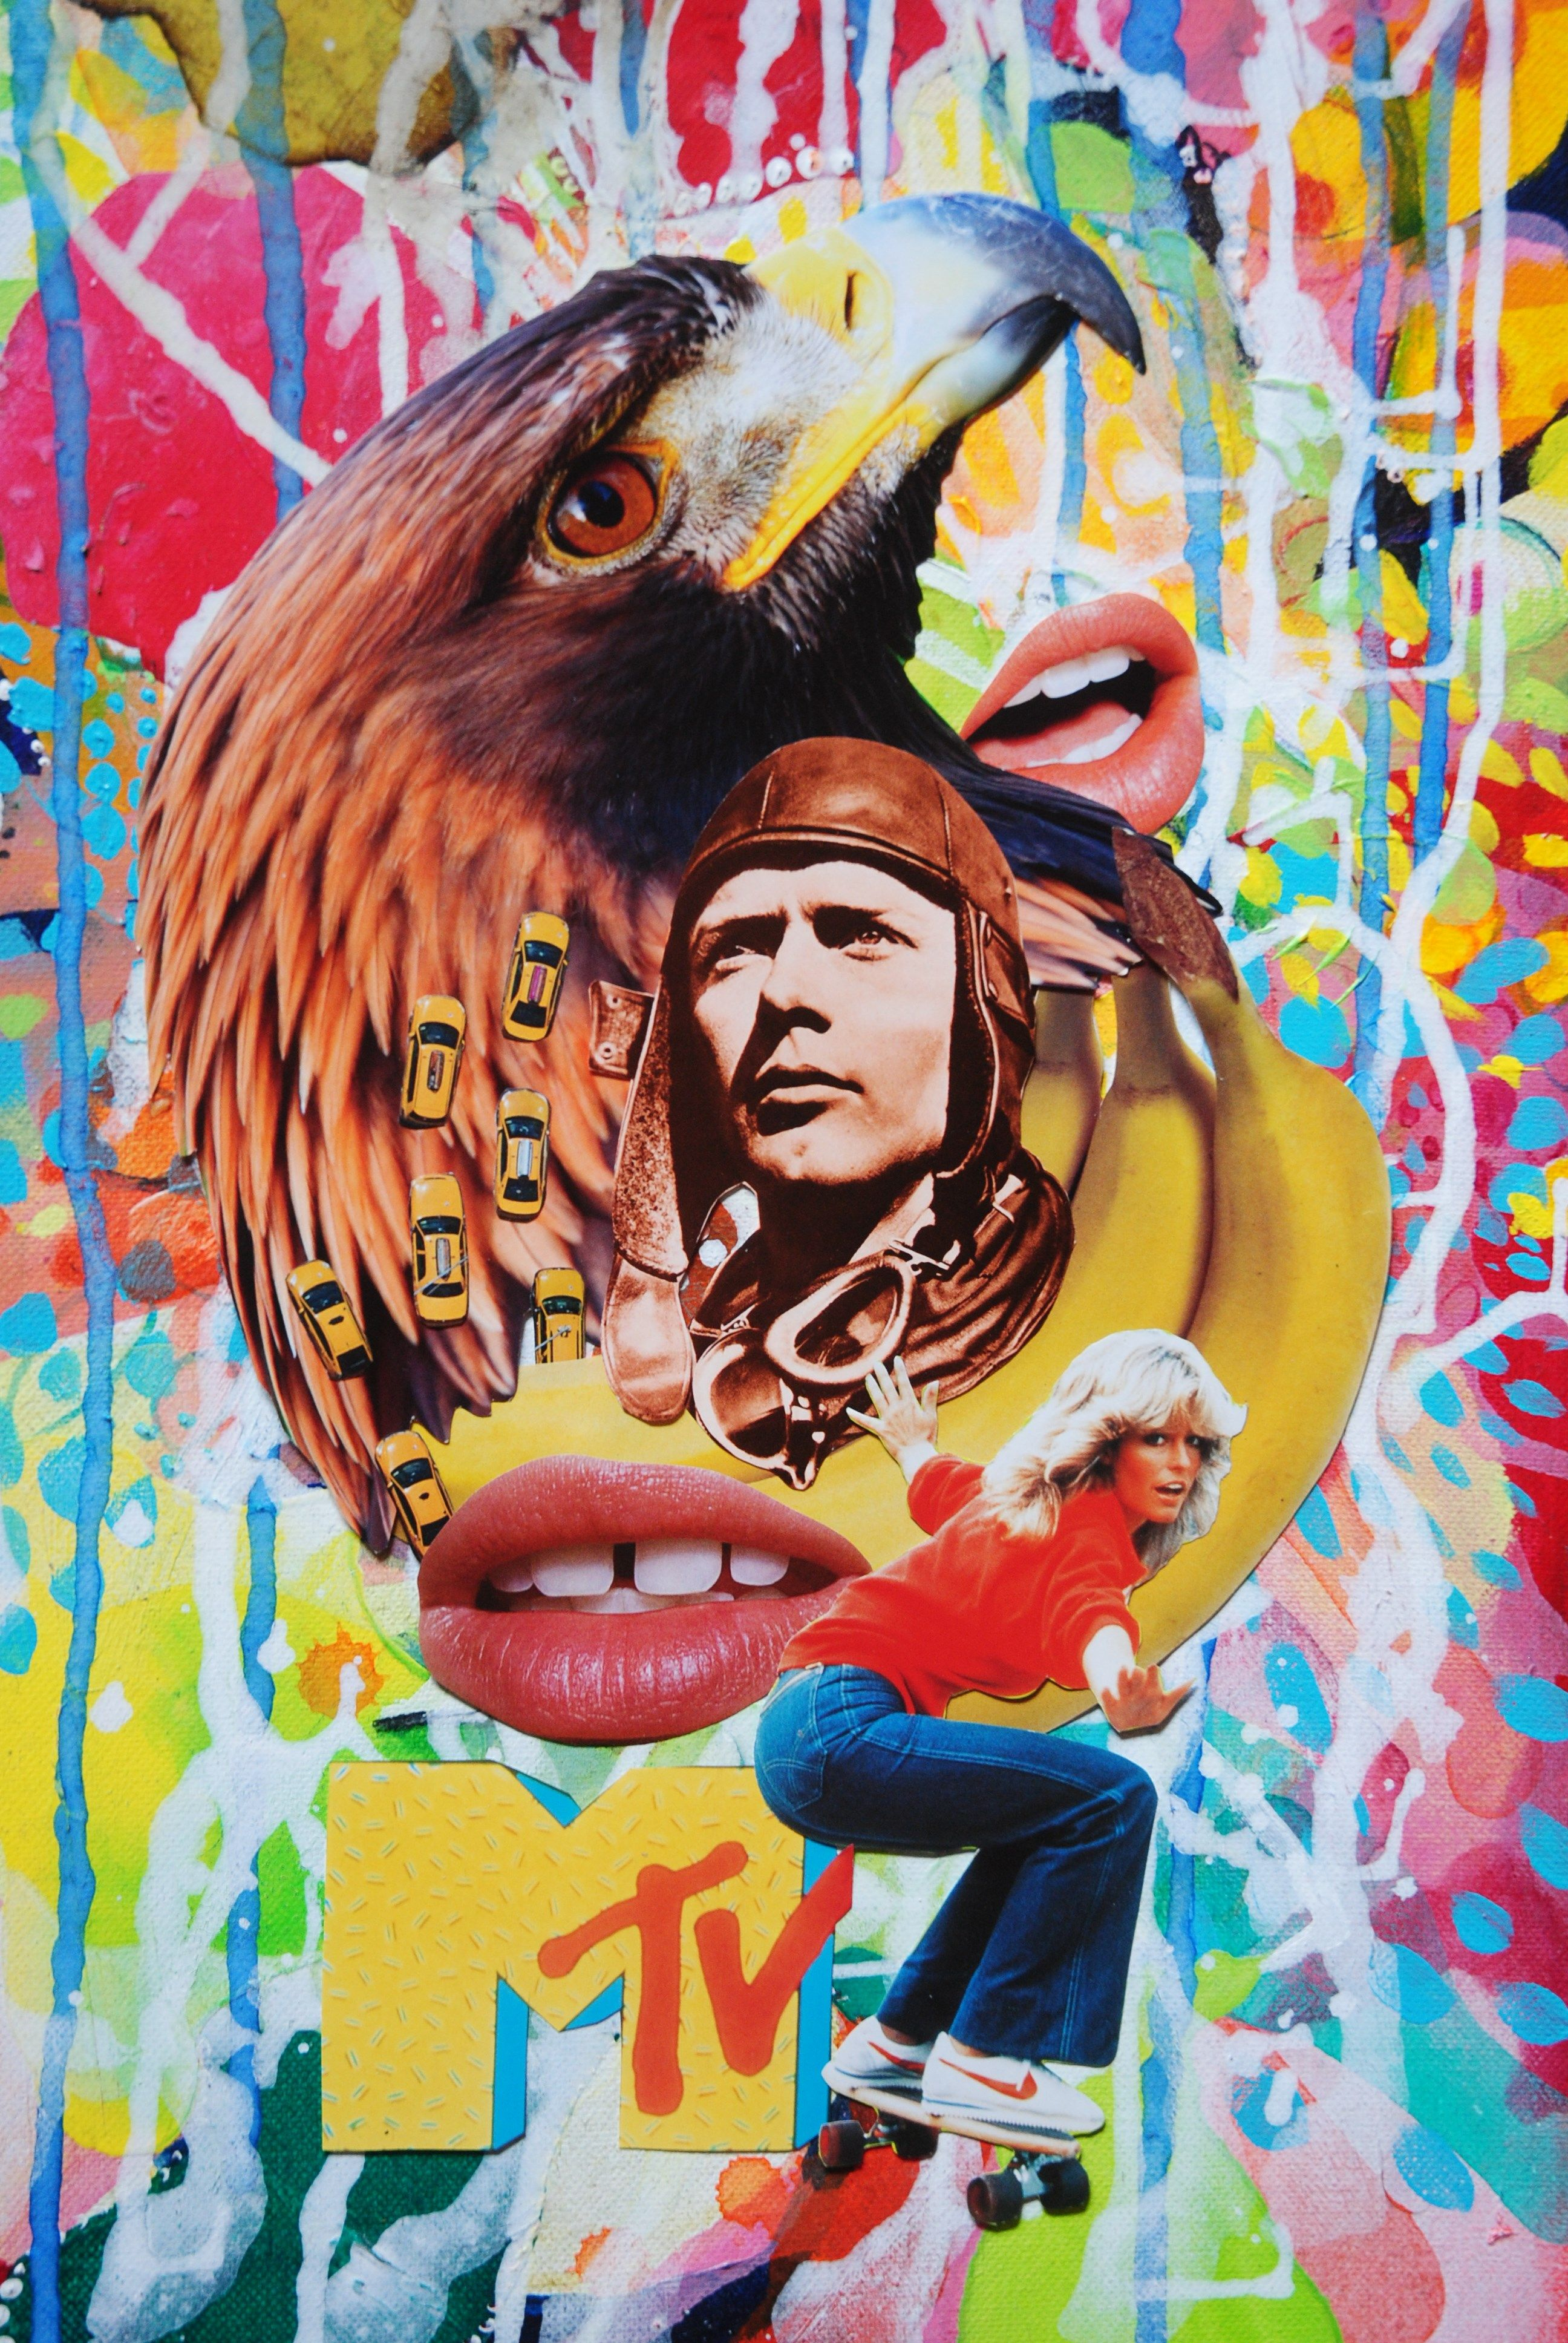 The Lone Eagle, John Turck Collage